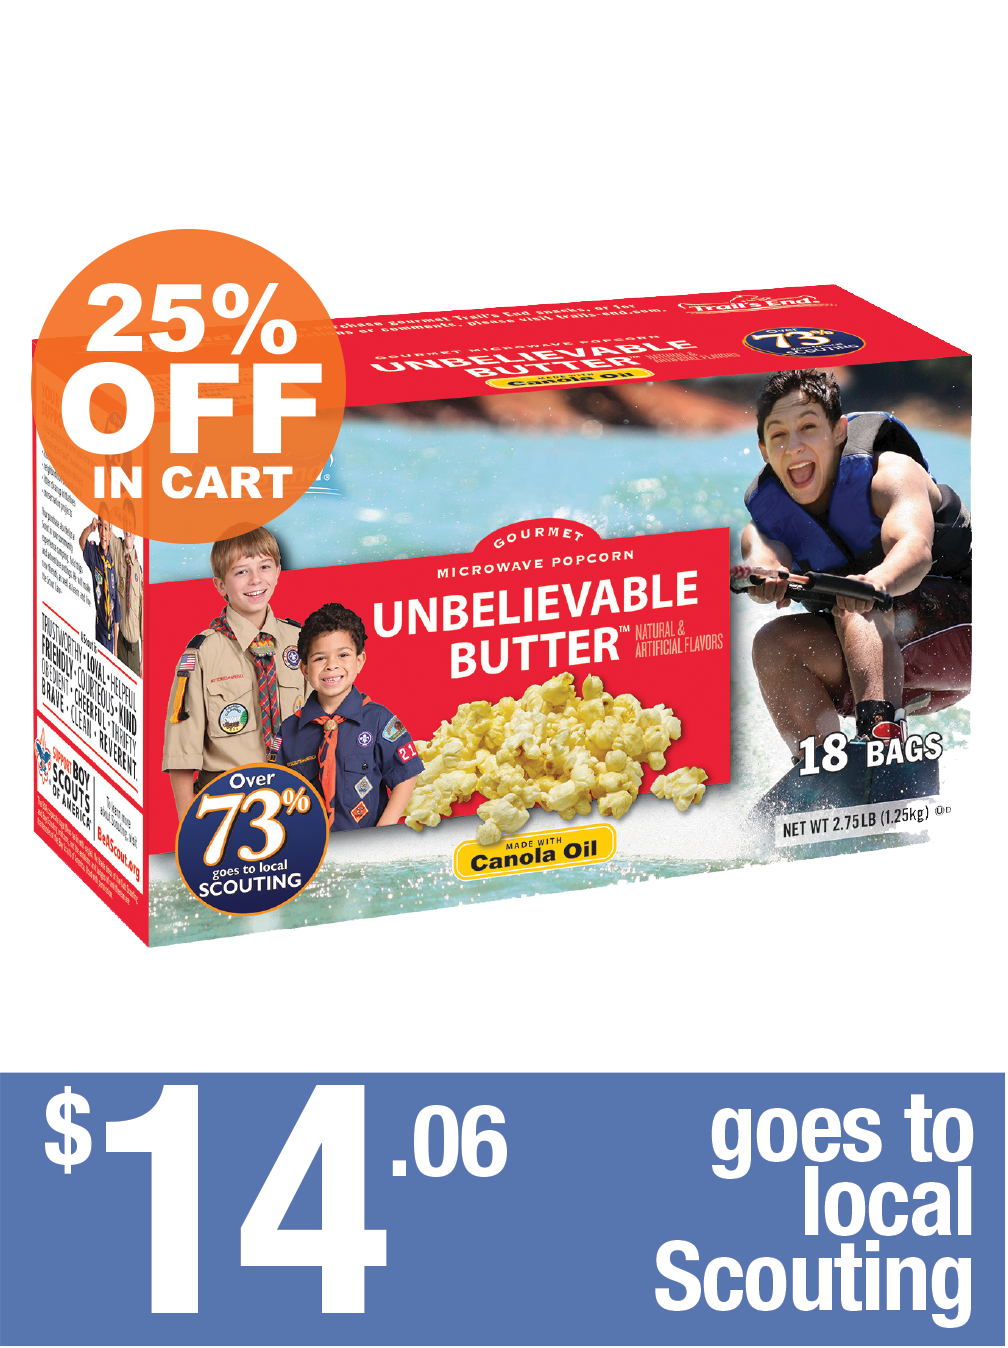 Unbelievable Butter - Microwave 18pk